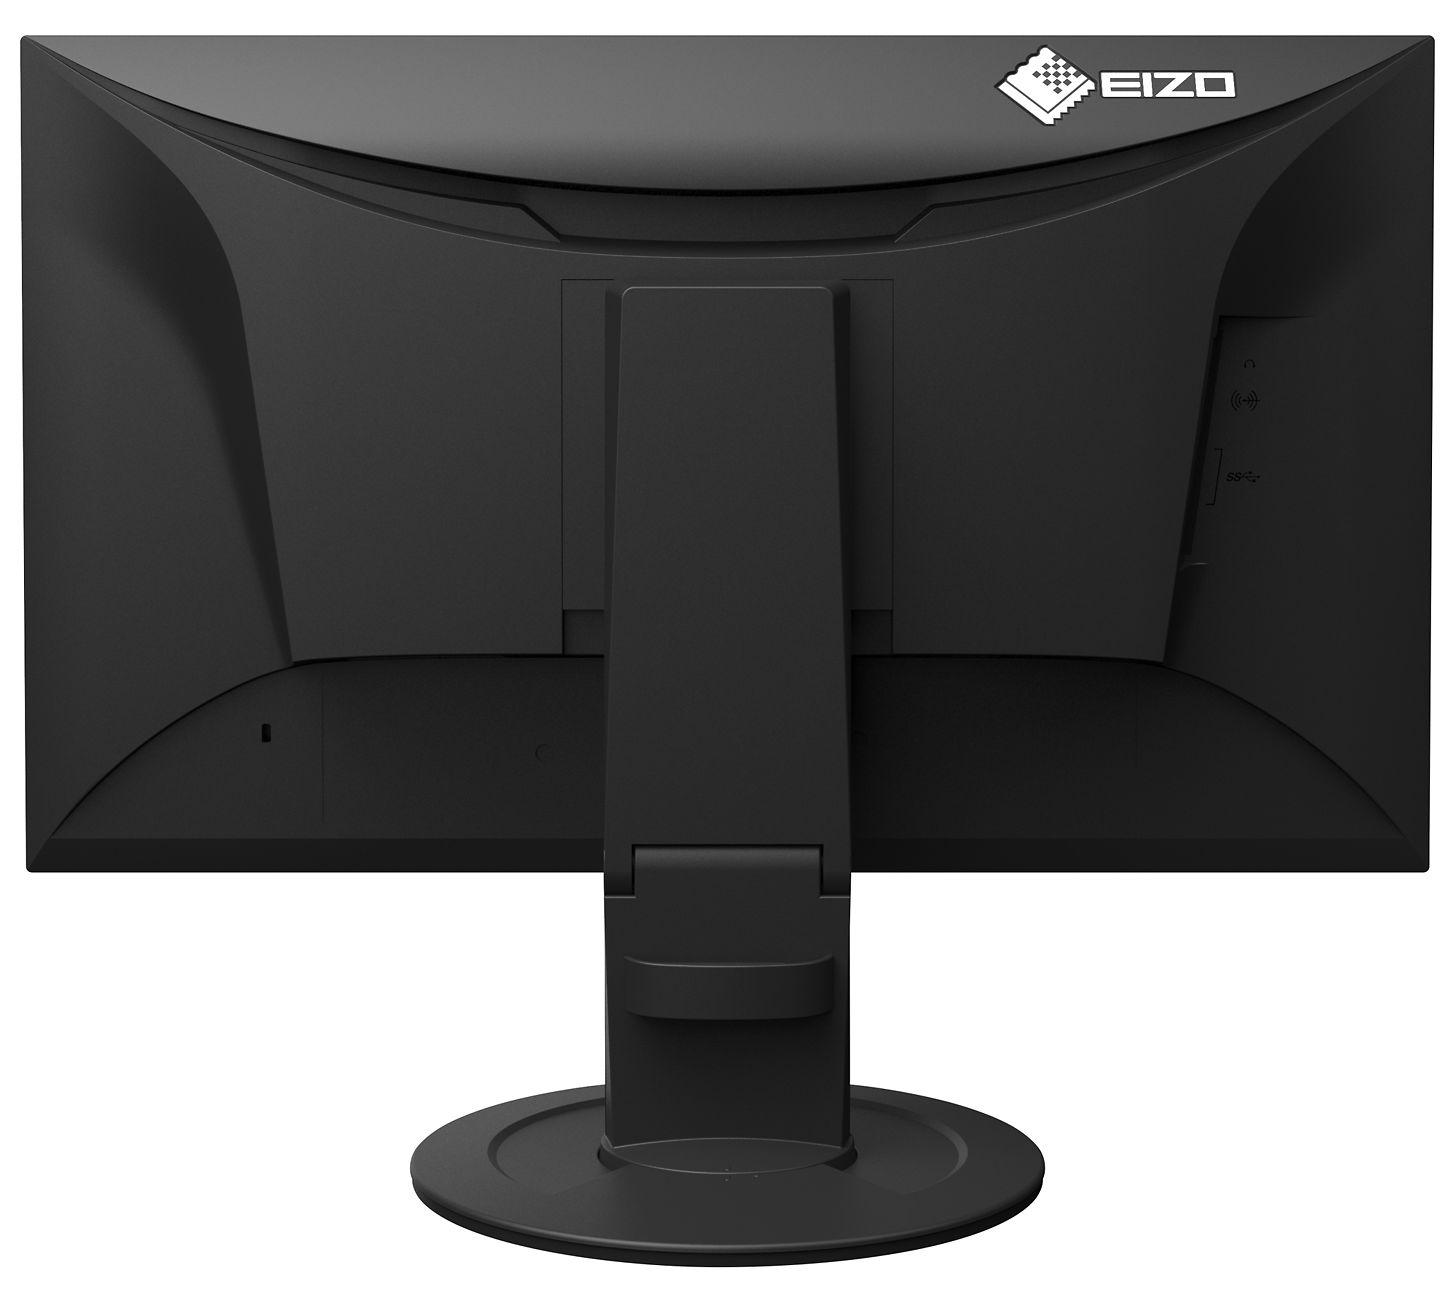 "Eizo Flexscan EV2460 24"" Monitor Image"